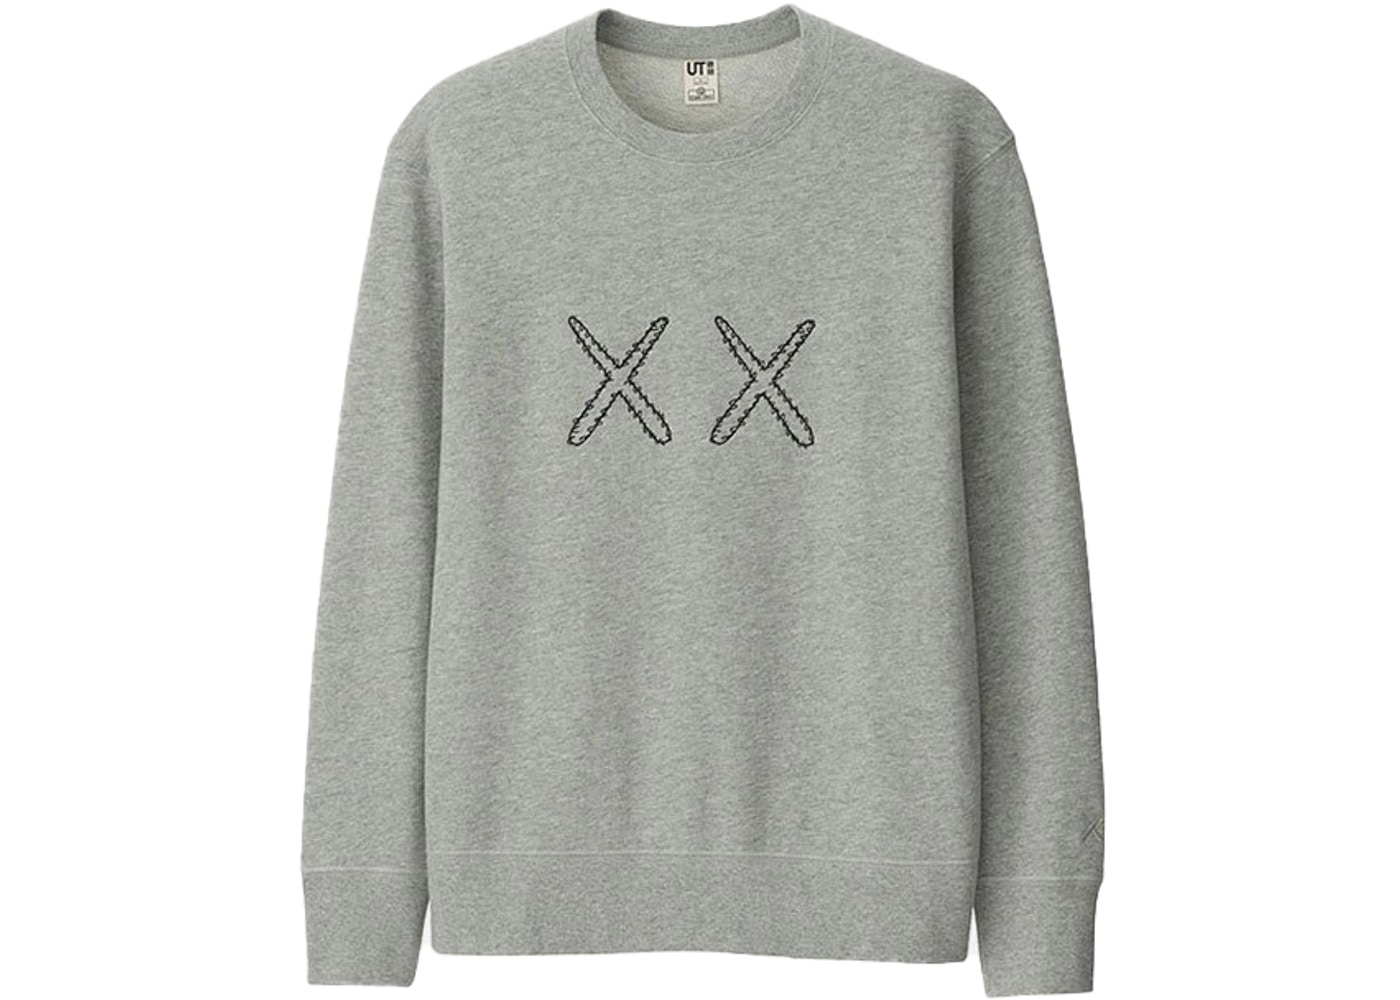 superior quality fashion styles exquisite design Shoptagr | Kaws X Uniqlo X Sesame Street Xx Sweatshirt (Us ...